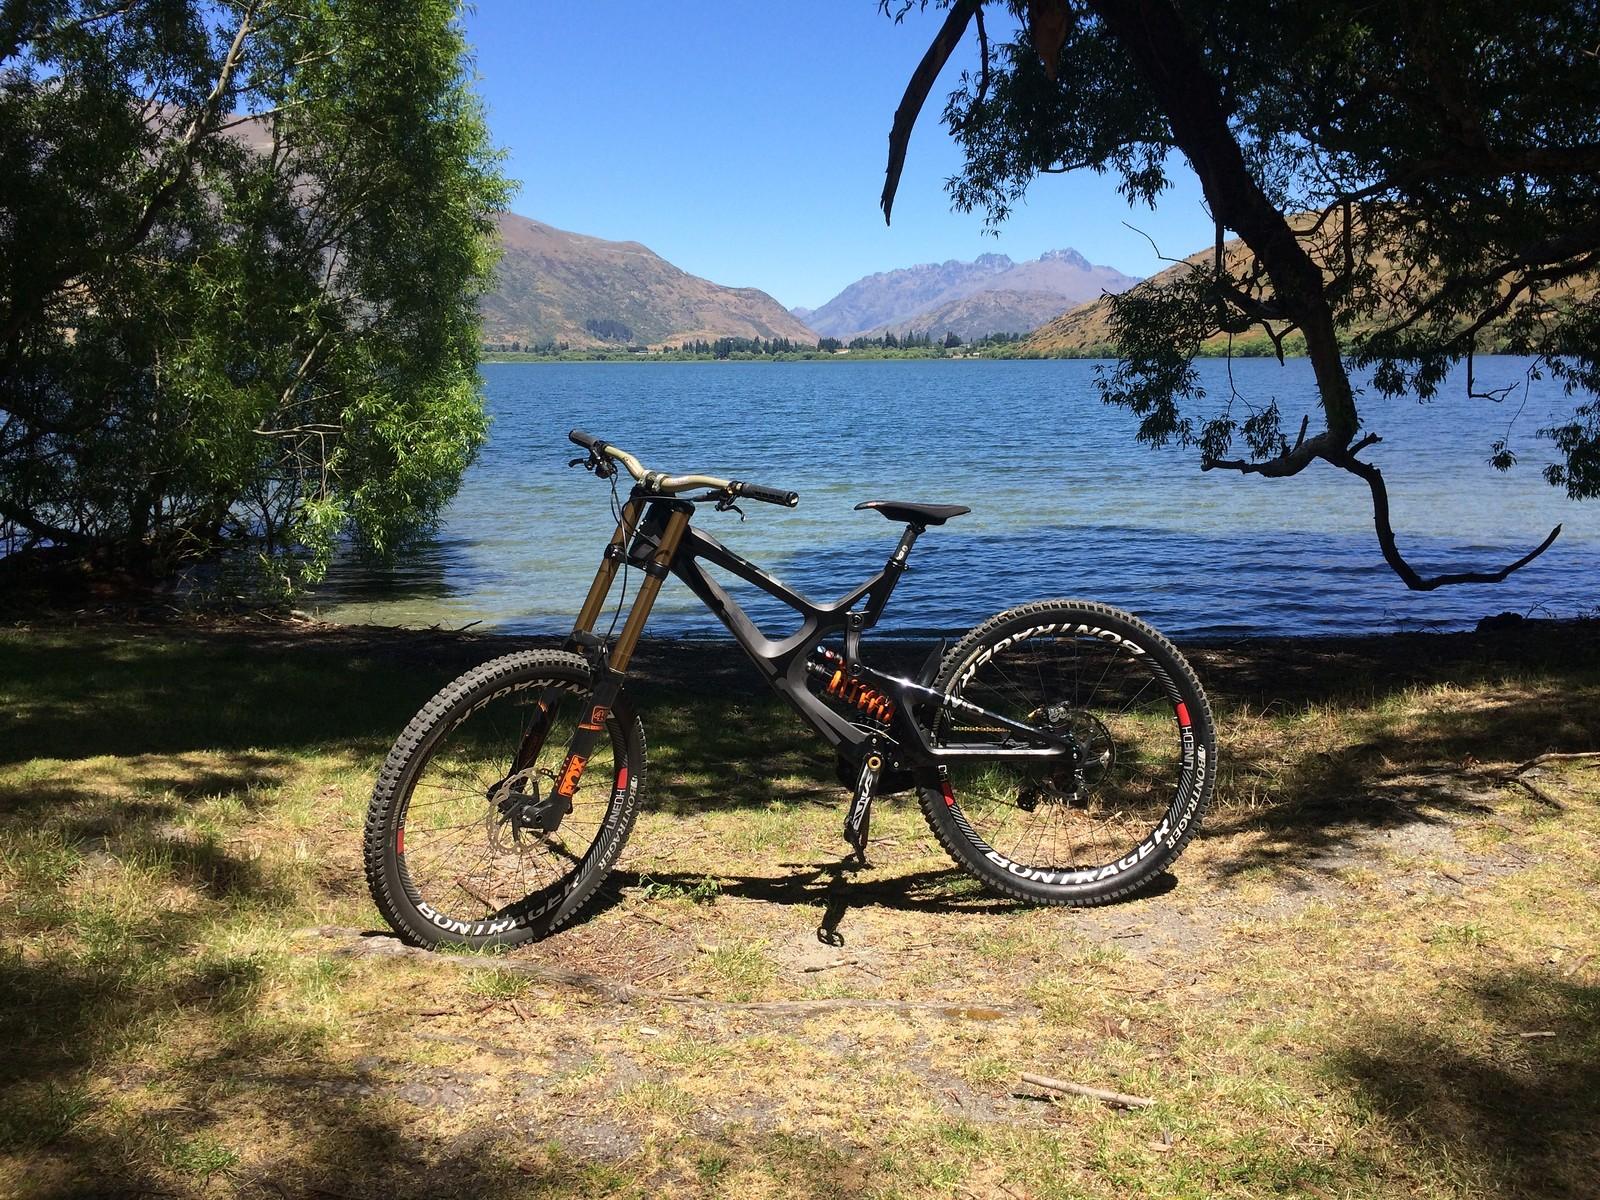 2016 M16 Carbon from Arrow Bikes, Arrowtown, NZ